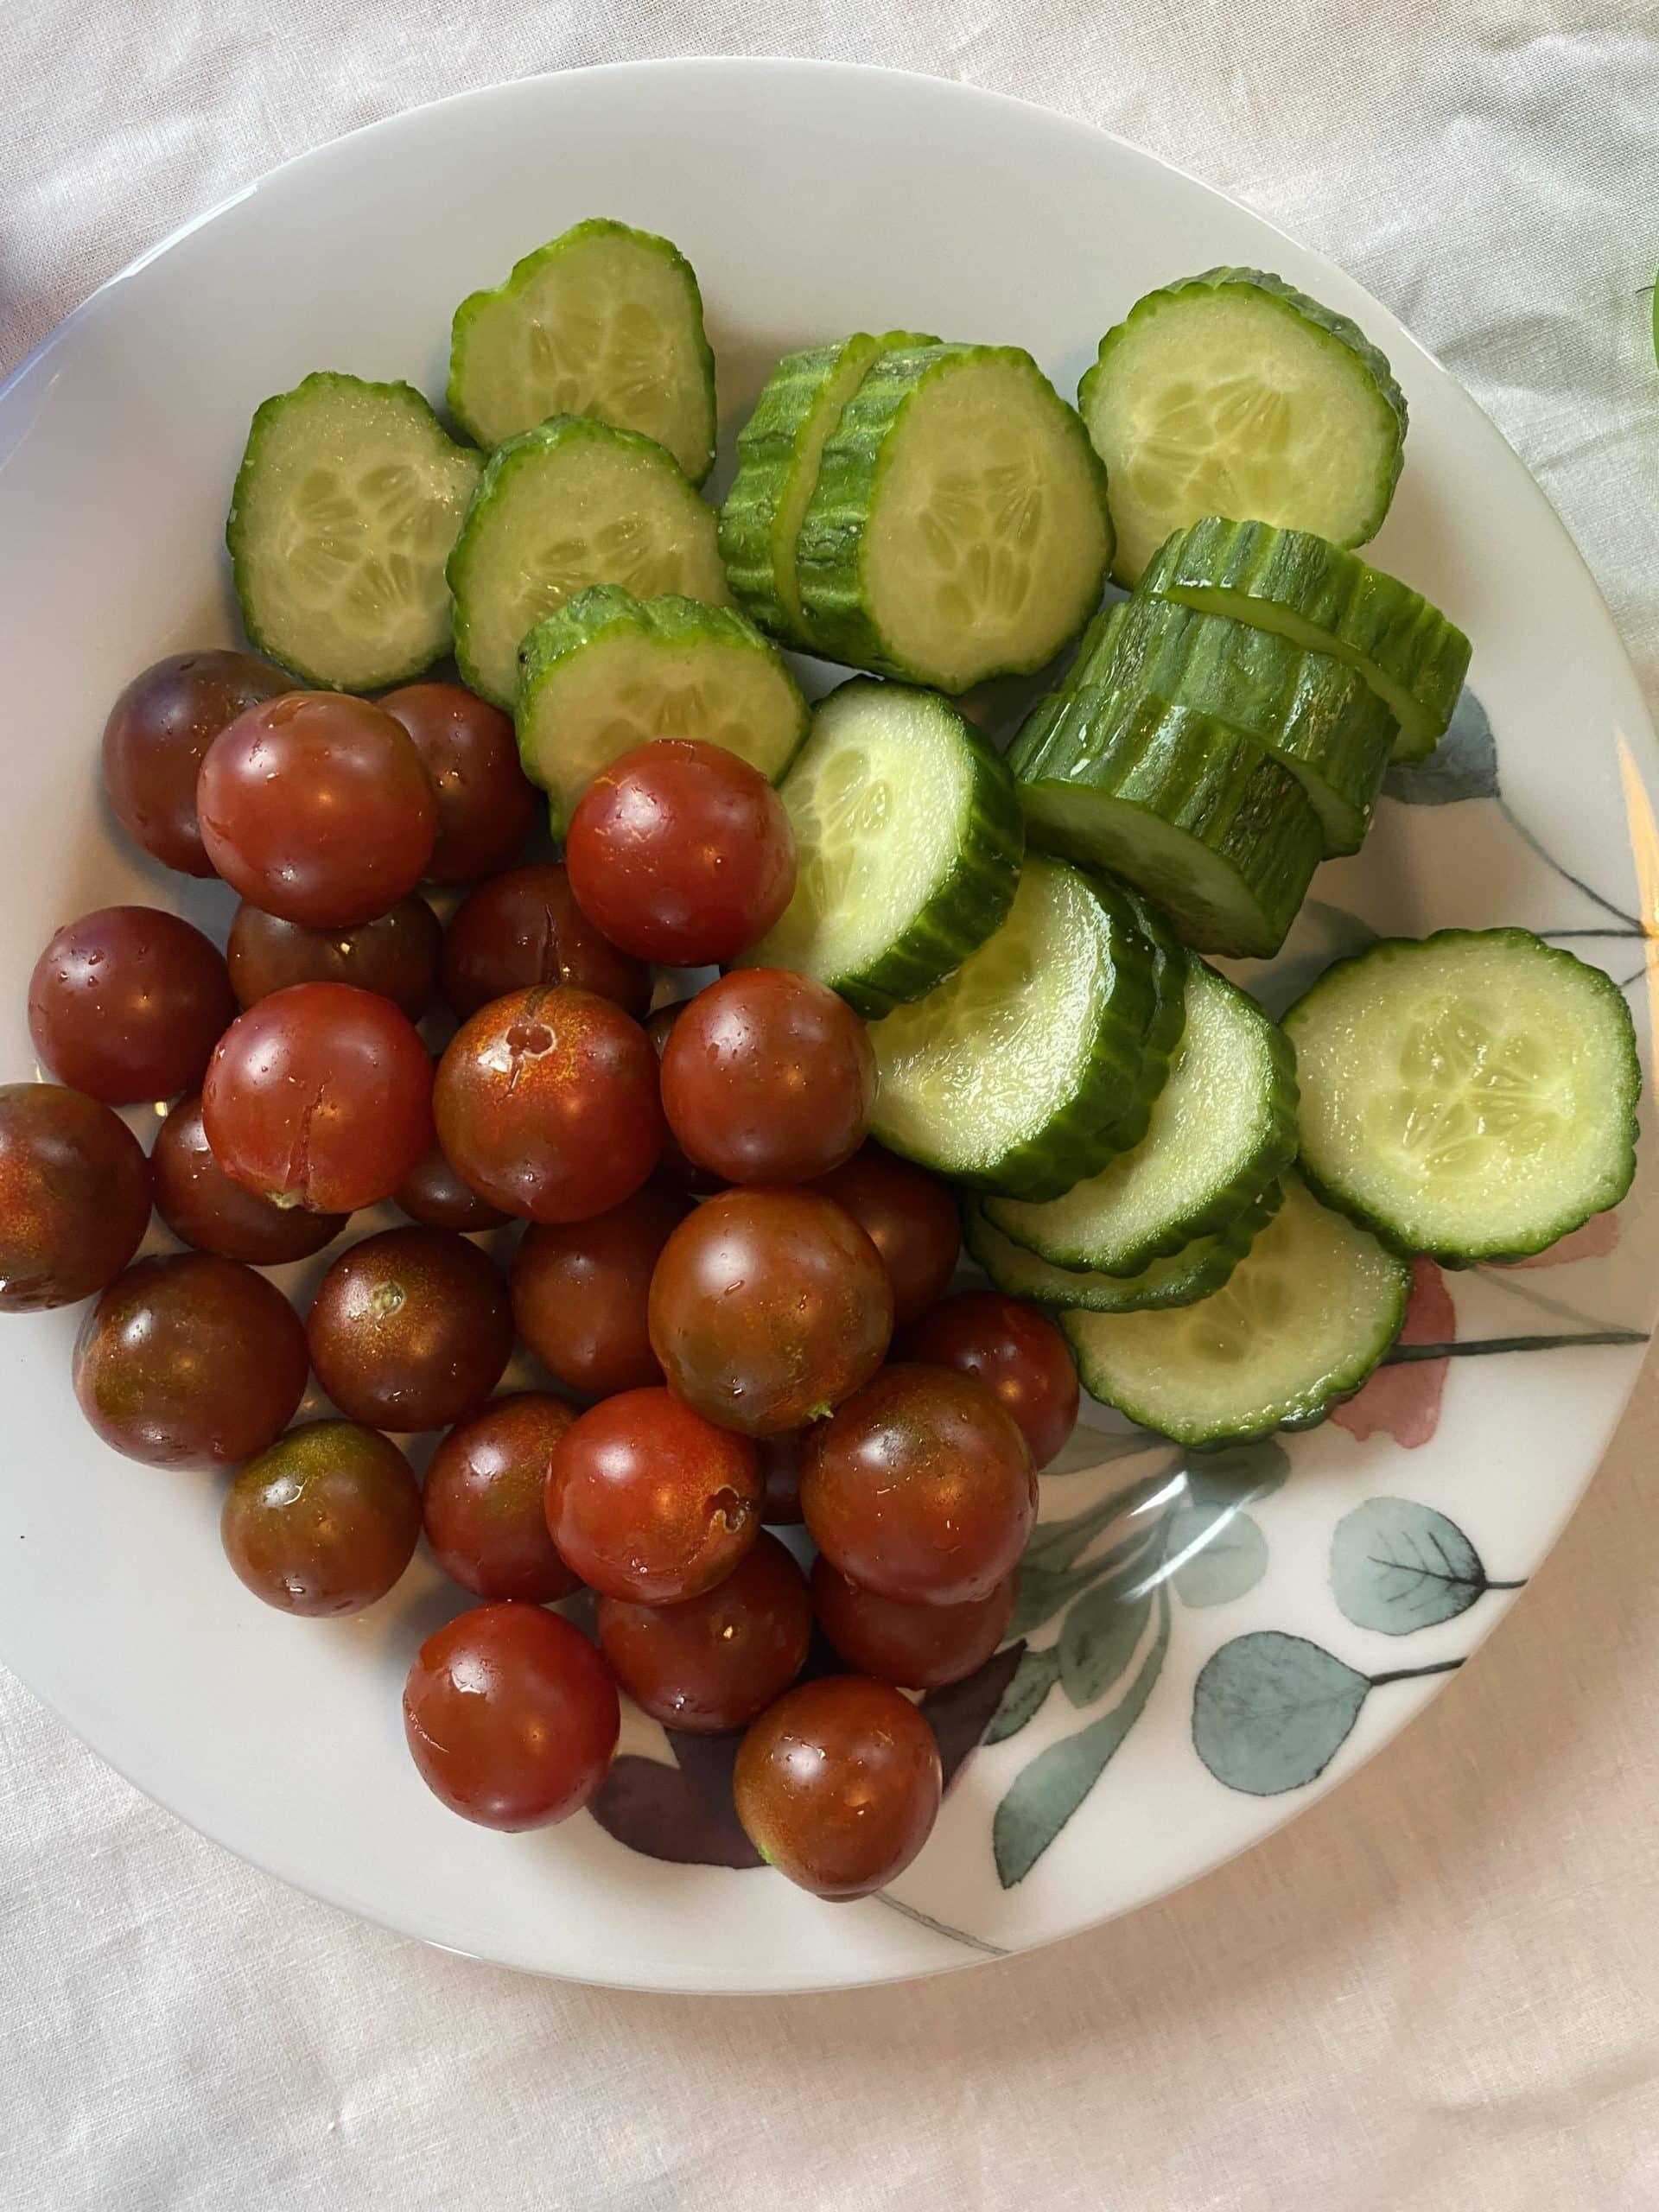 Zum Abendbrot dann Gemüse aus dem eigenen Garten.